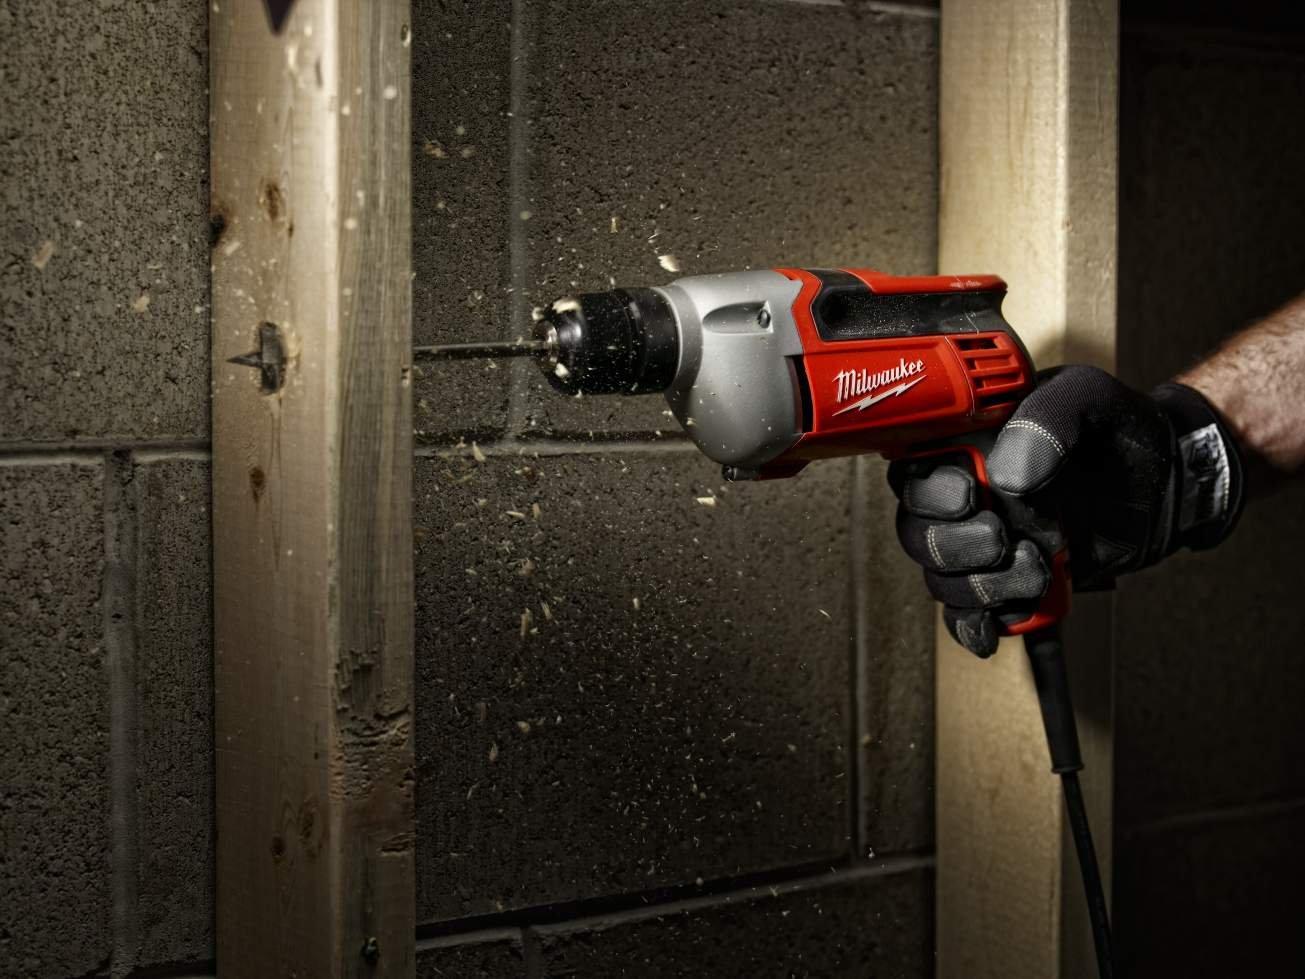 Milwaukee 0240-20 3/8-Inch Drill